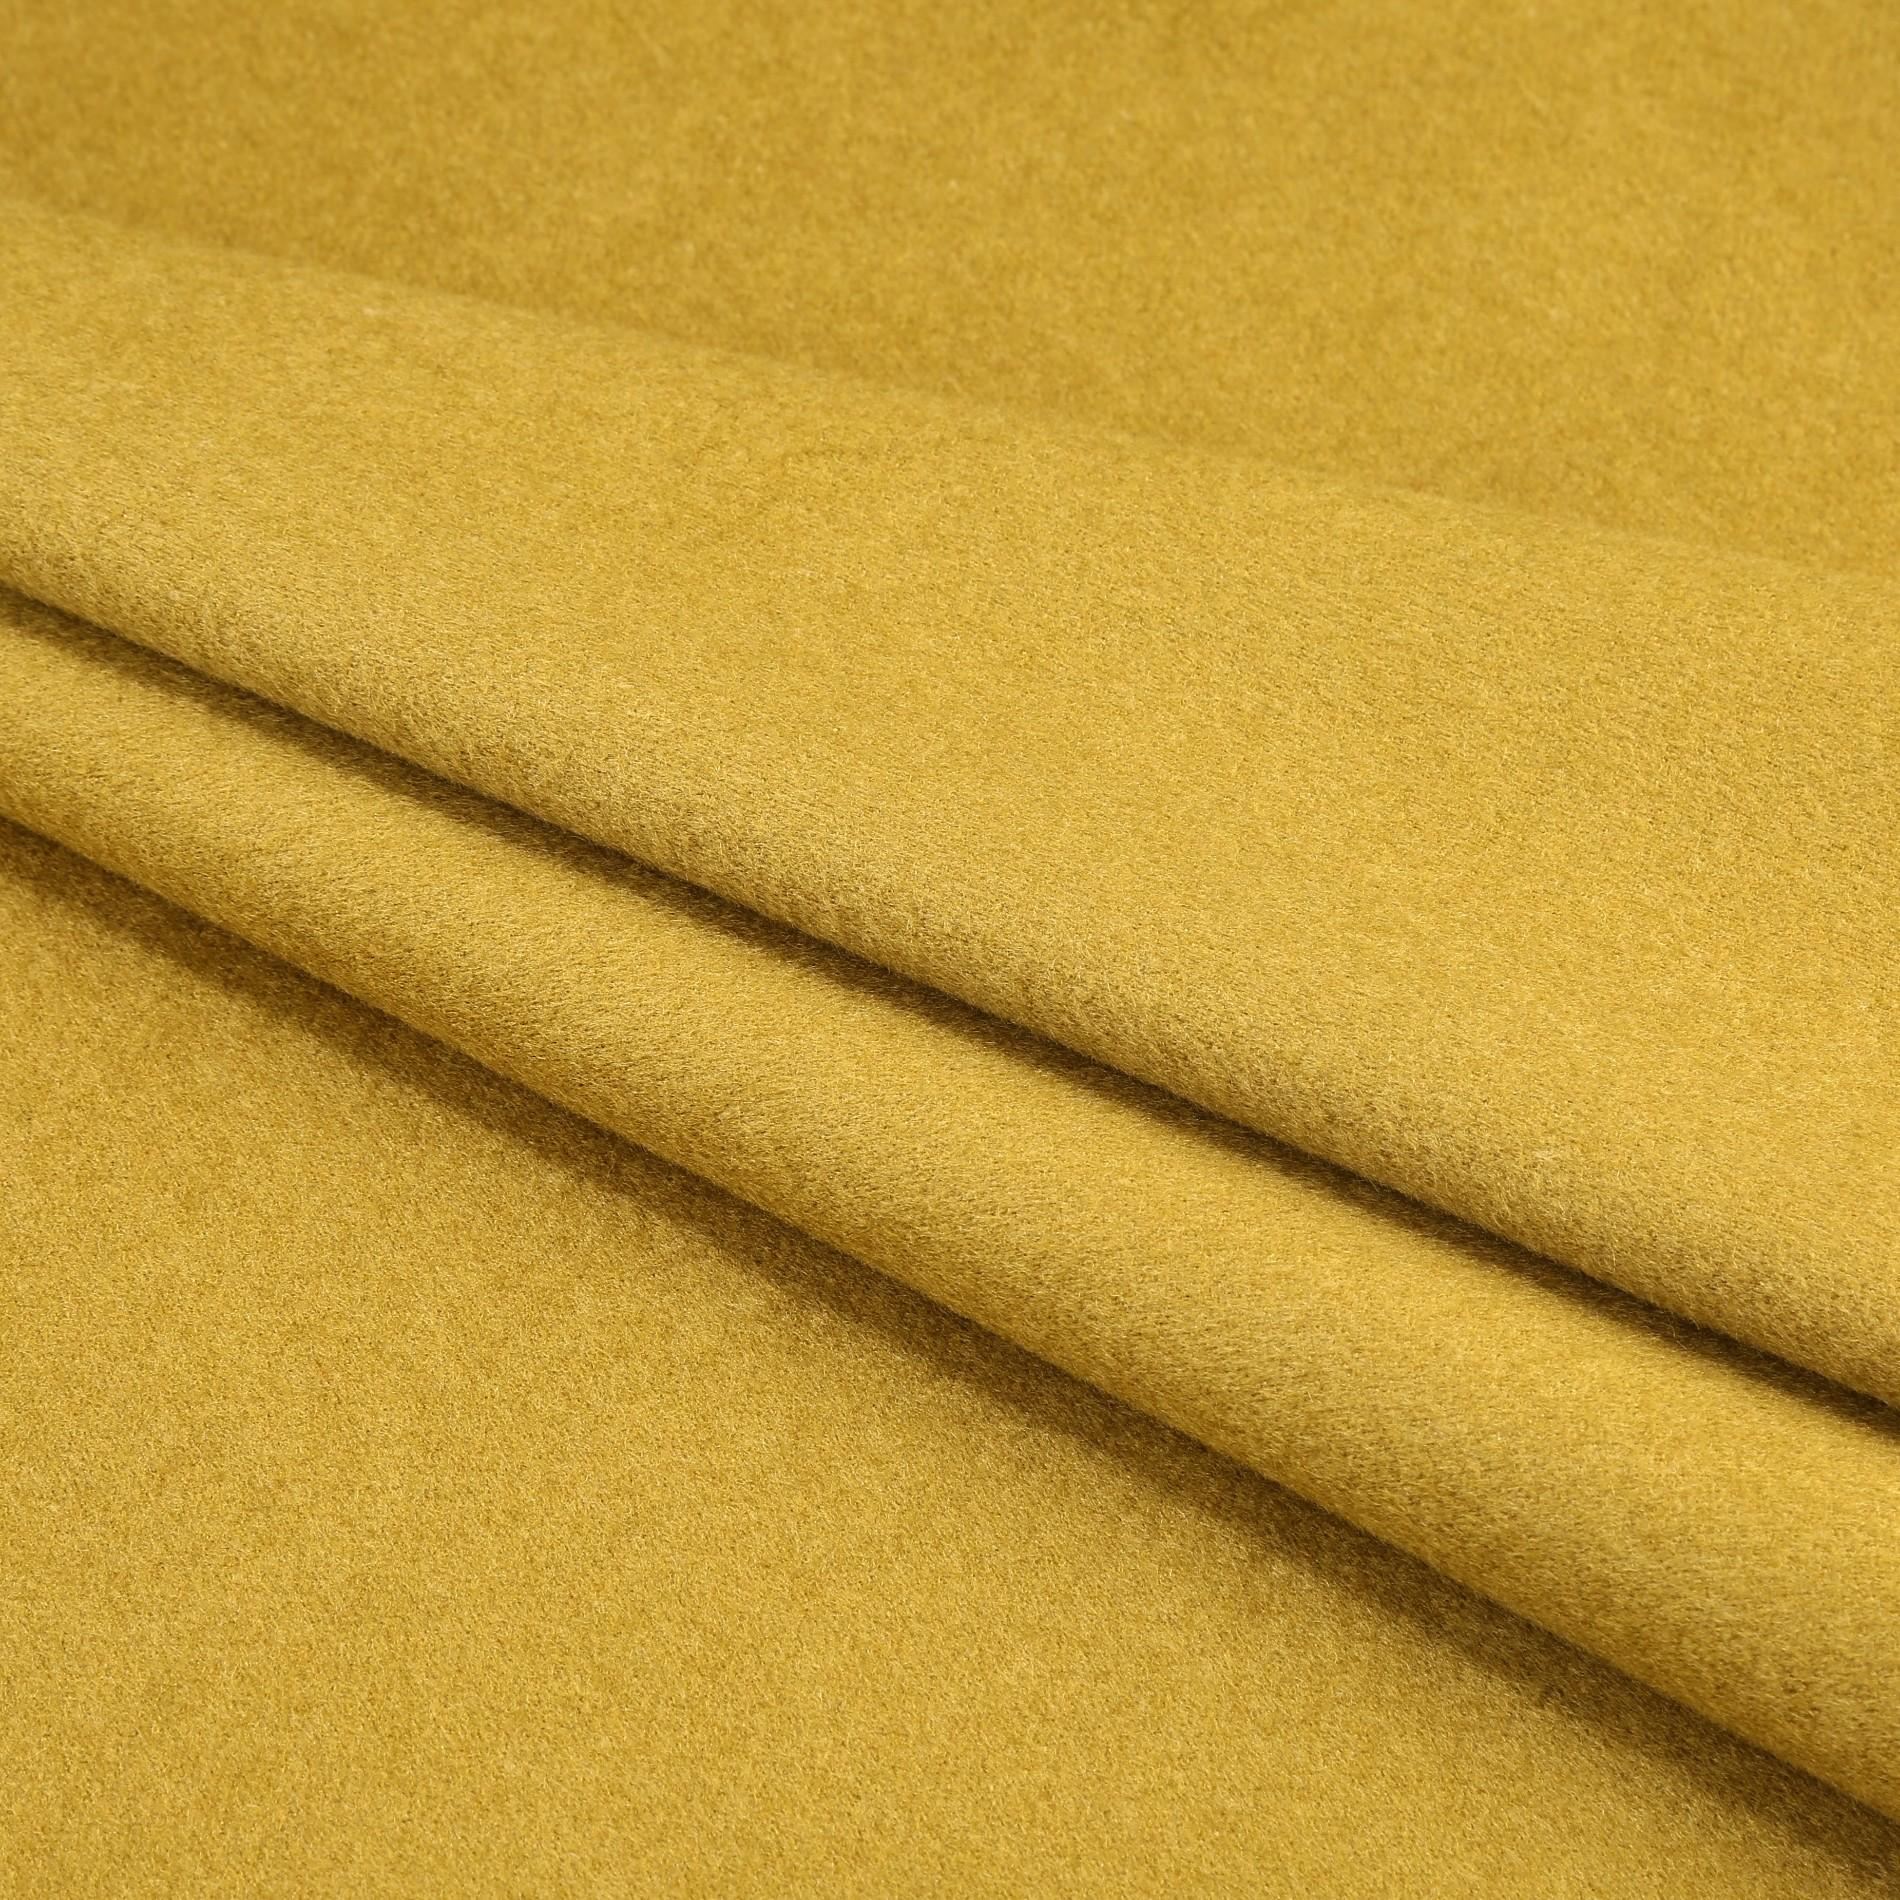 Woolen One Side Overcoat Fabric